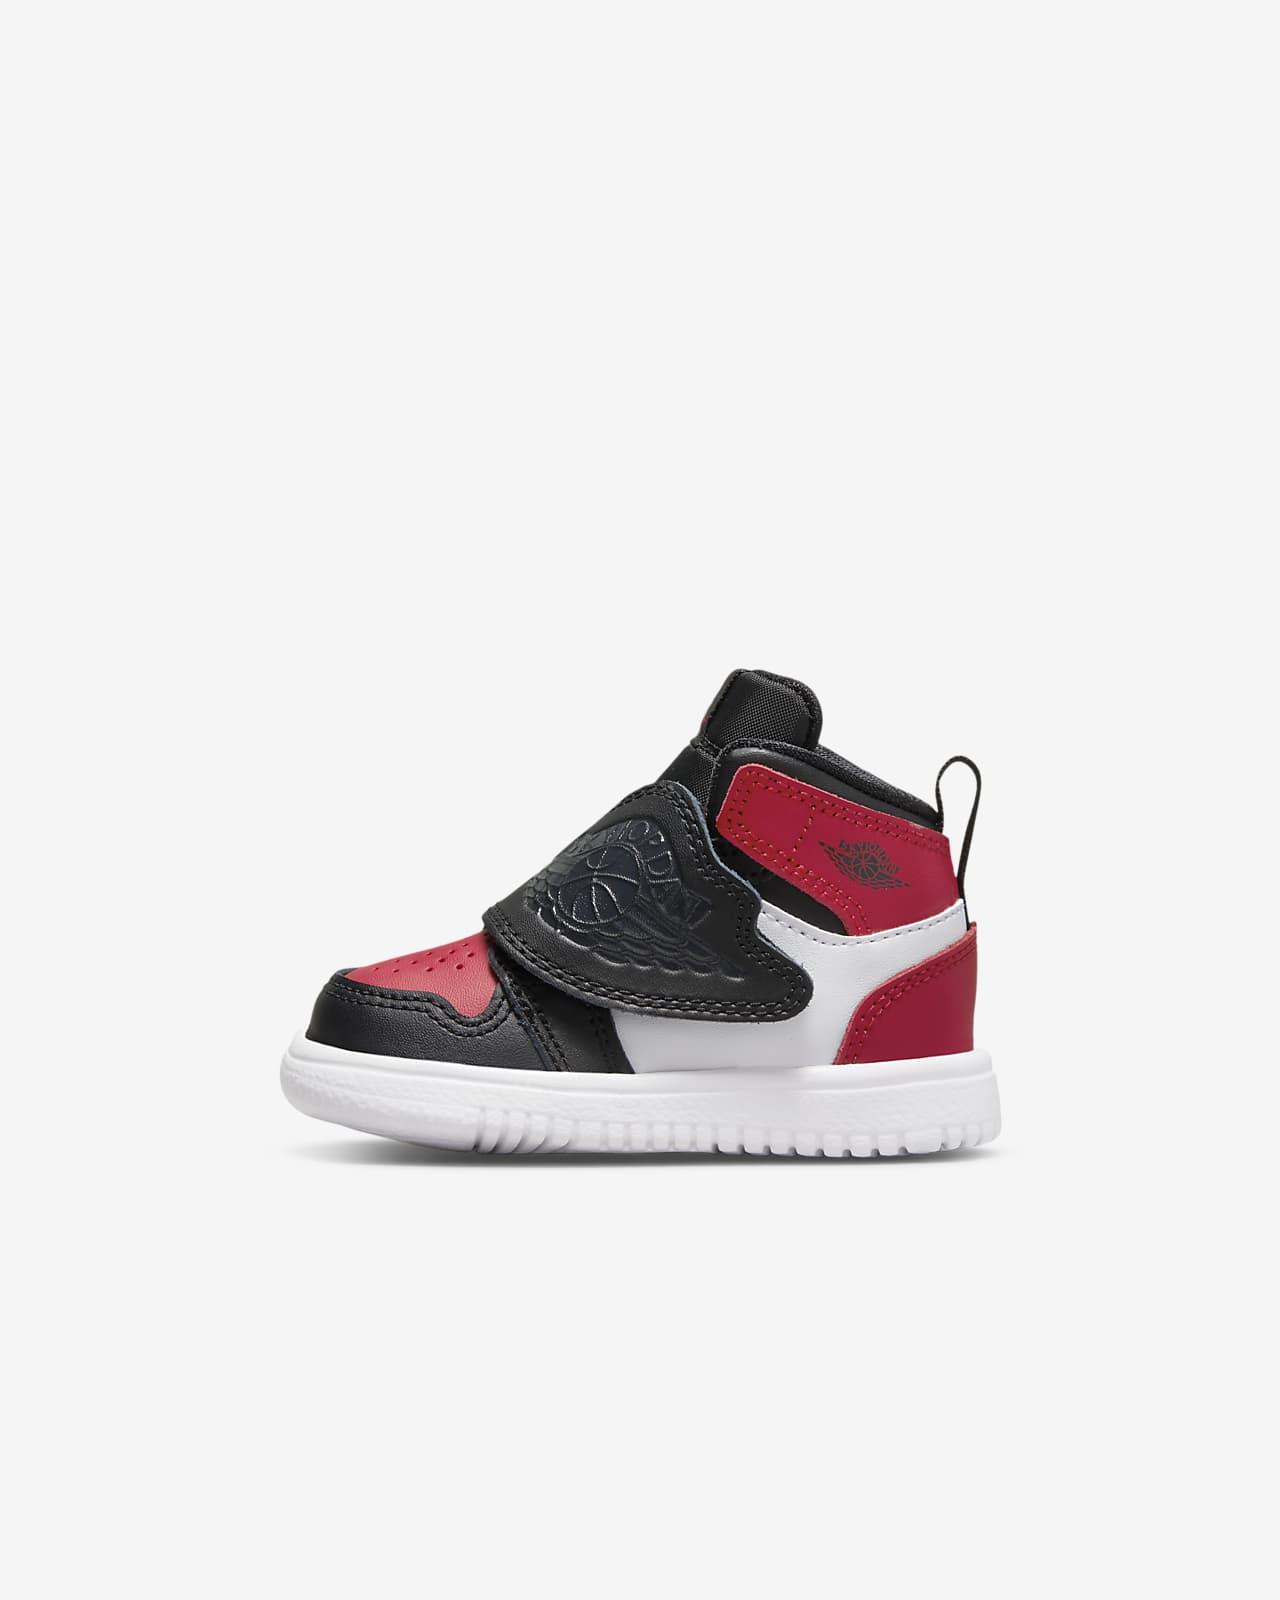 Sky Jordan 1 Baby and Toddler Shoe. Nike PH